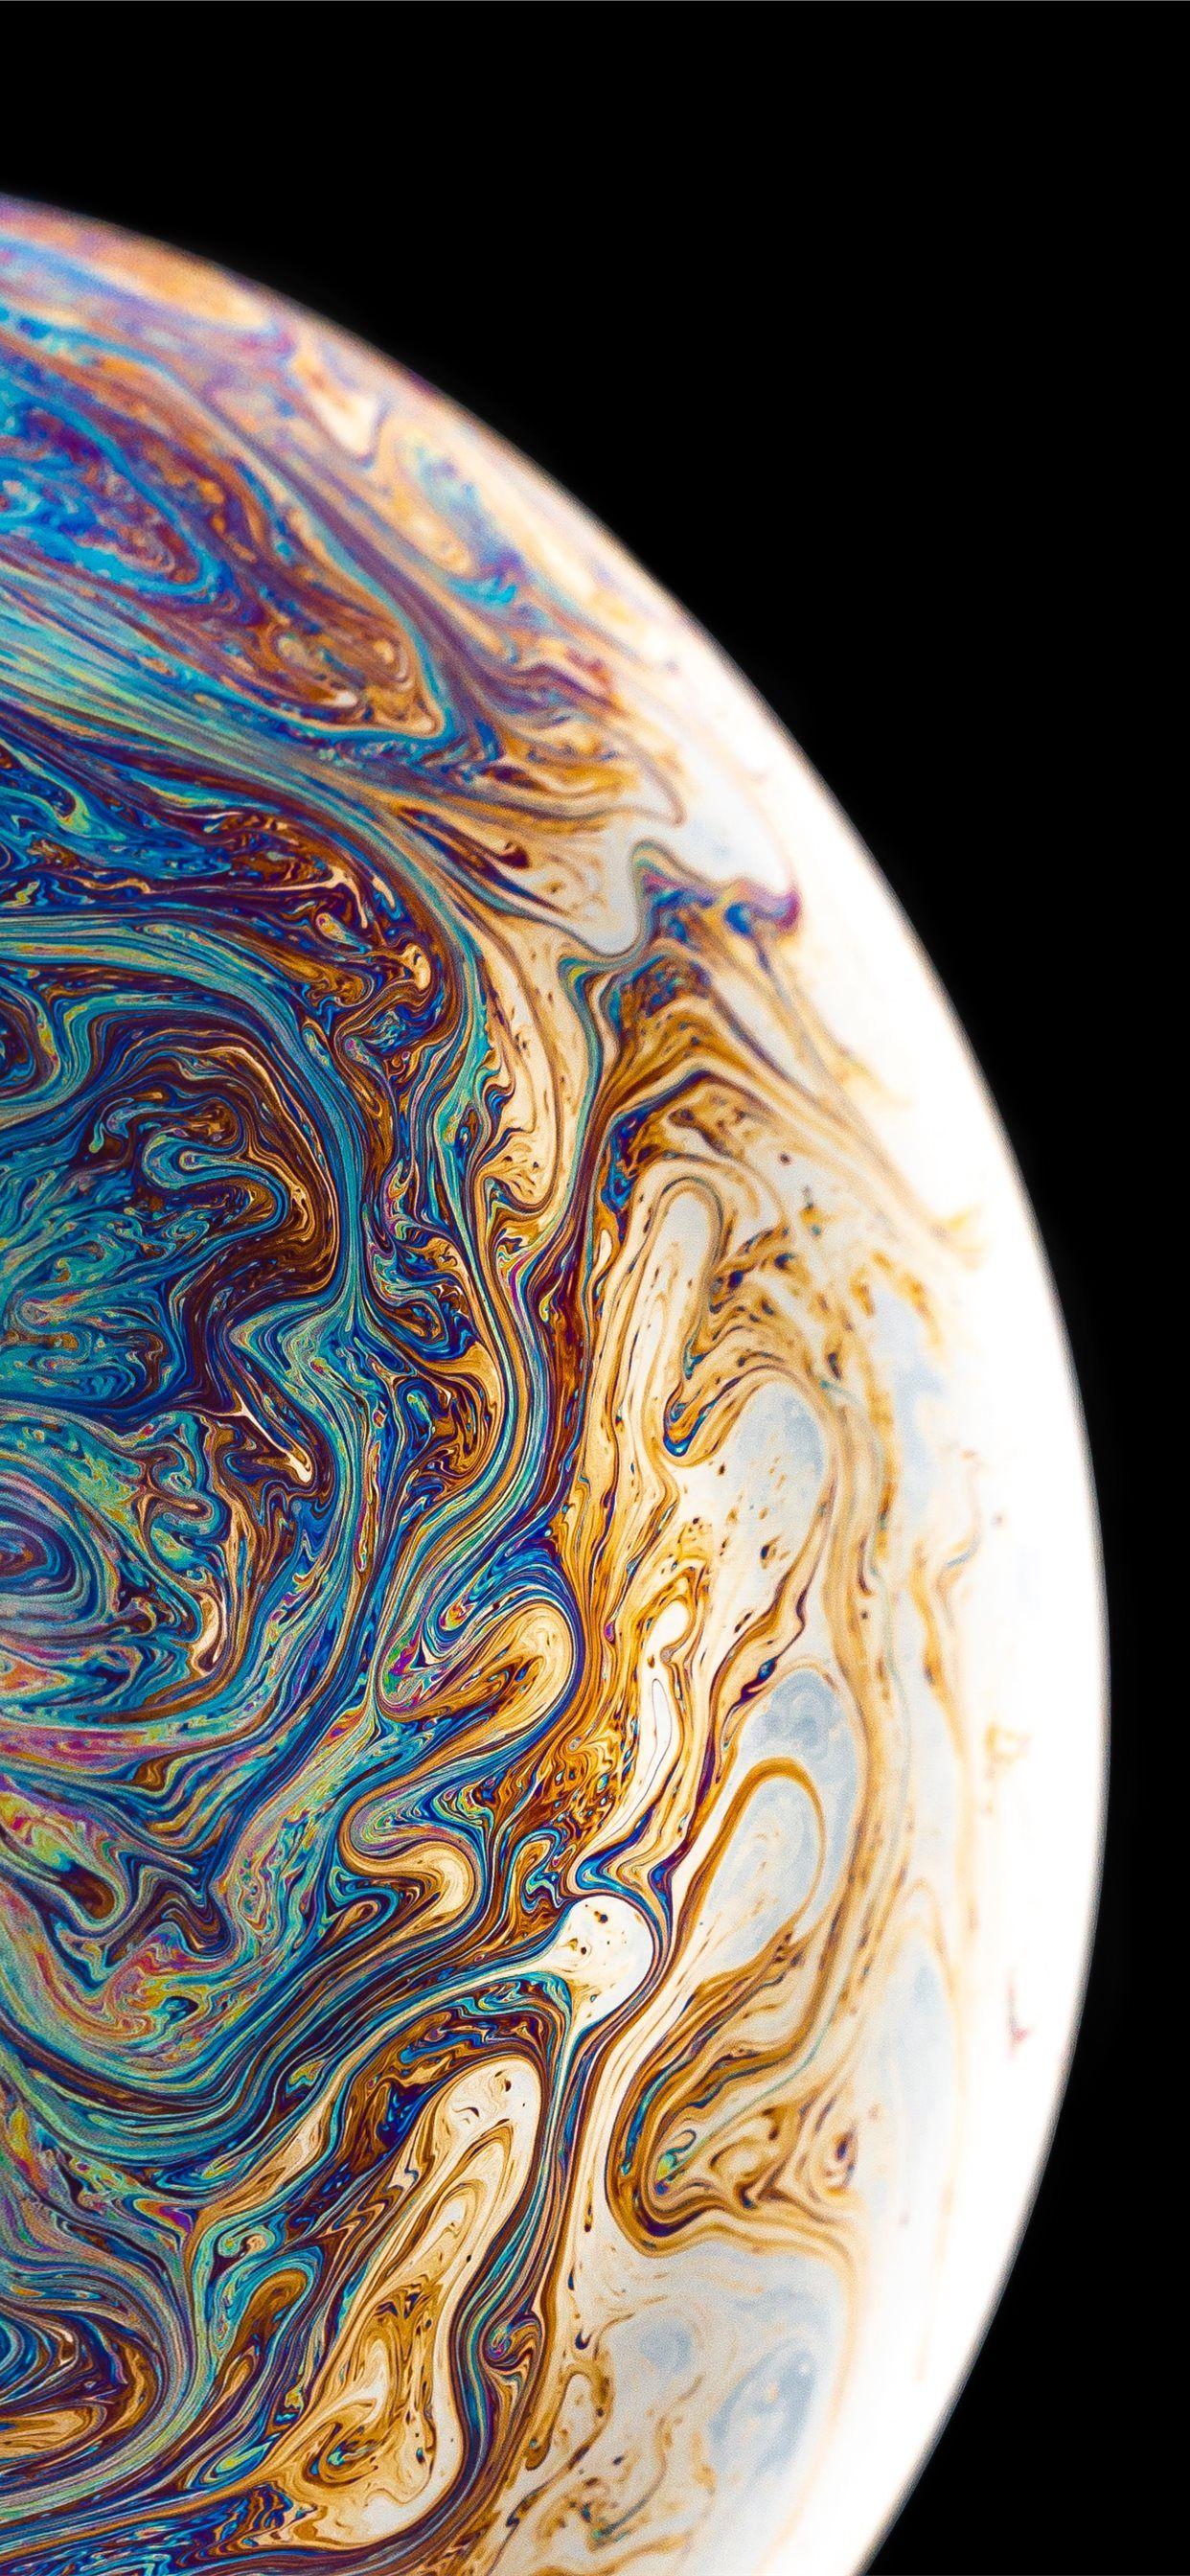 اجمل خلفيات ايفون Wallpaper Iphone 8 Plus Tecnologis Beautiful Wallpapers Aesthetic Wallpapers Lit Wallpaper